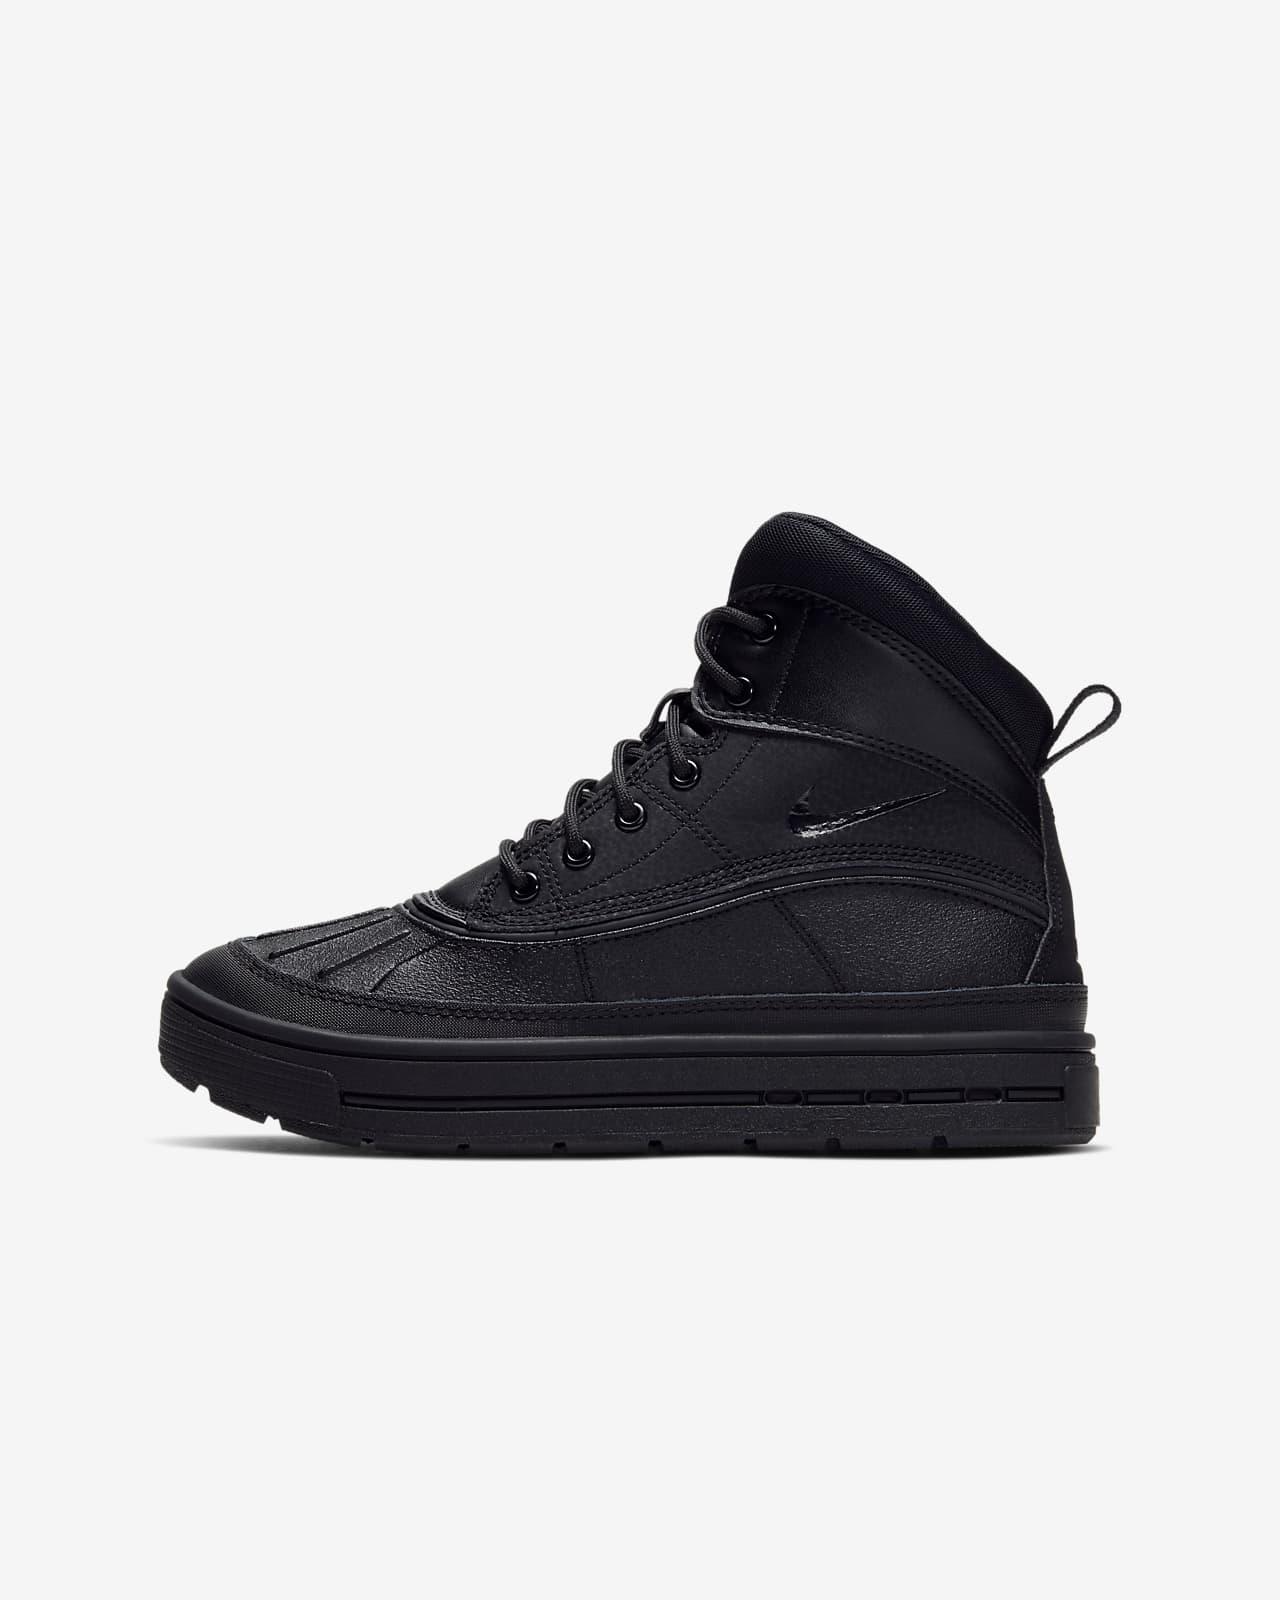 Nike Woodside 2 High ACG Big Kids' Boots